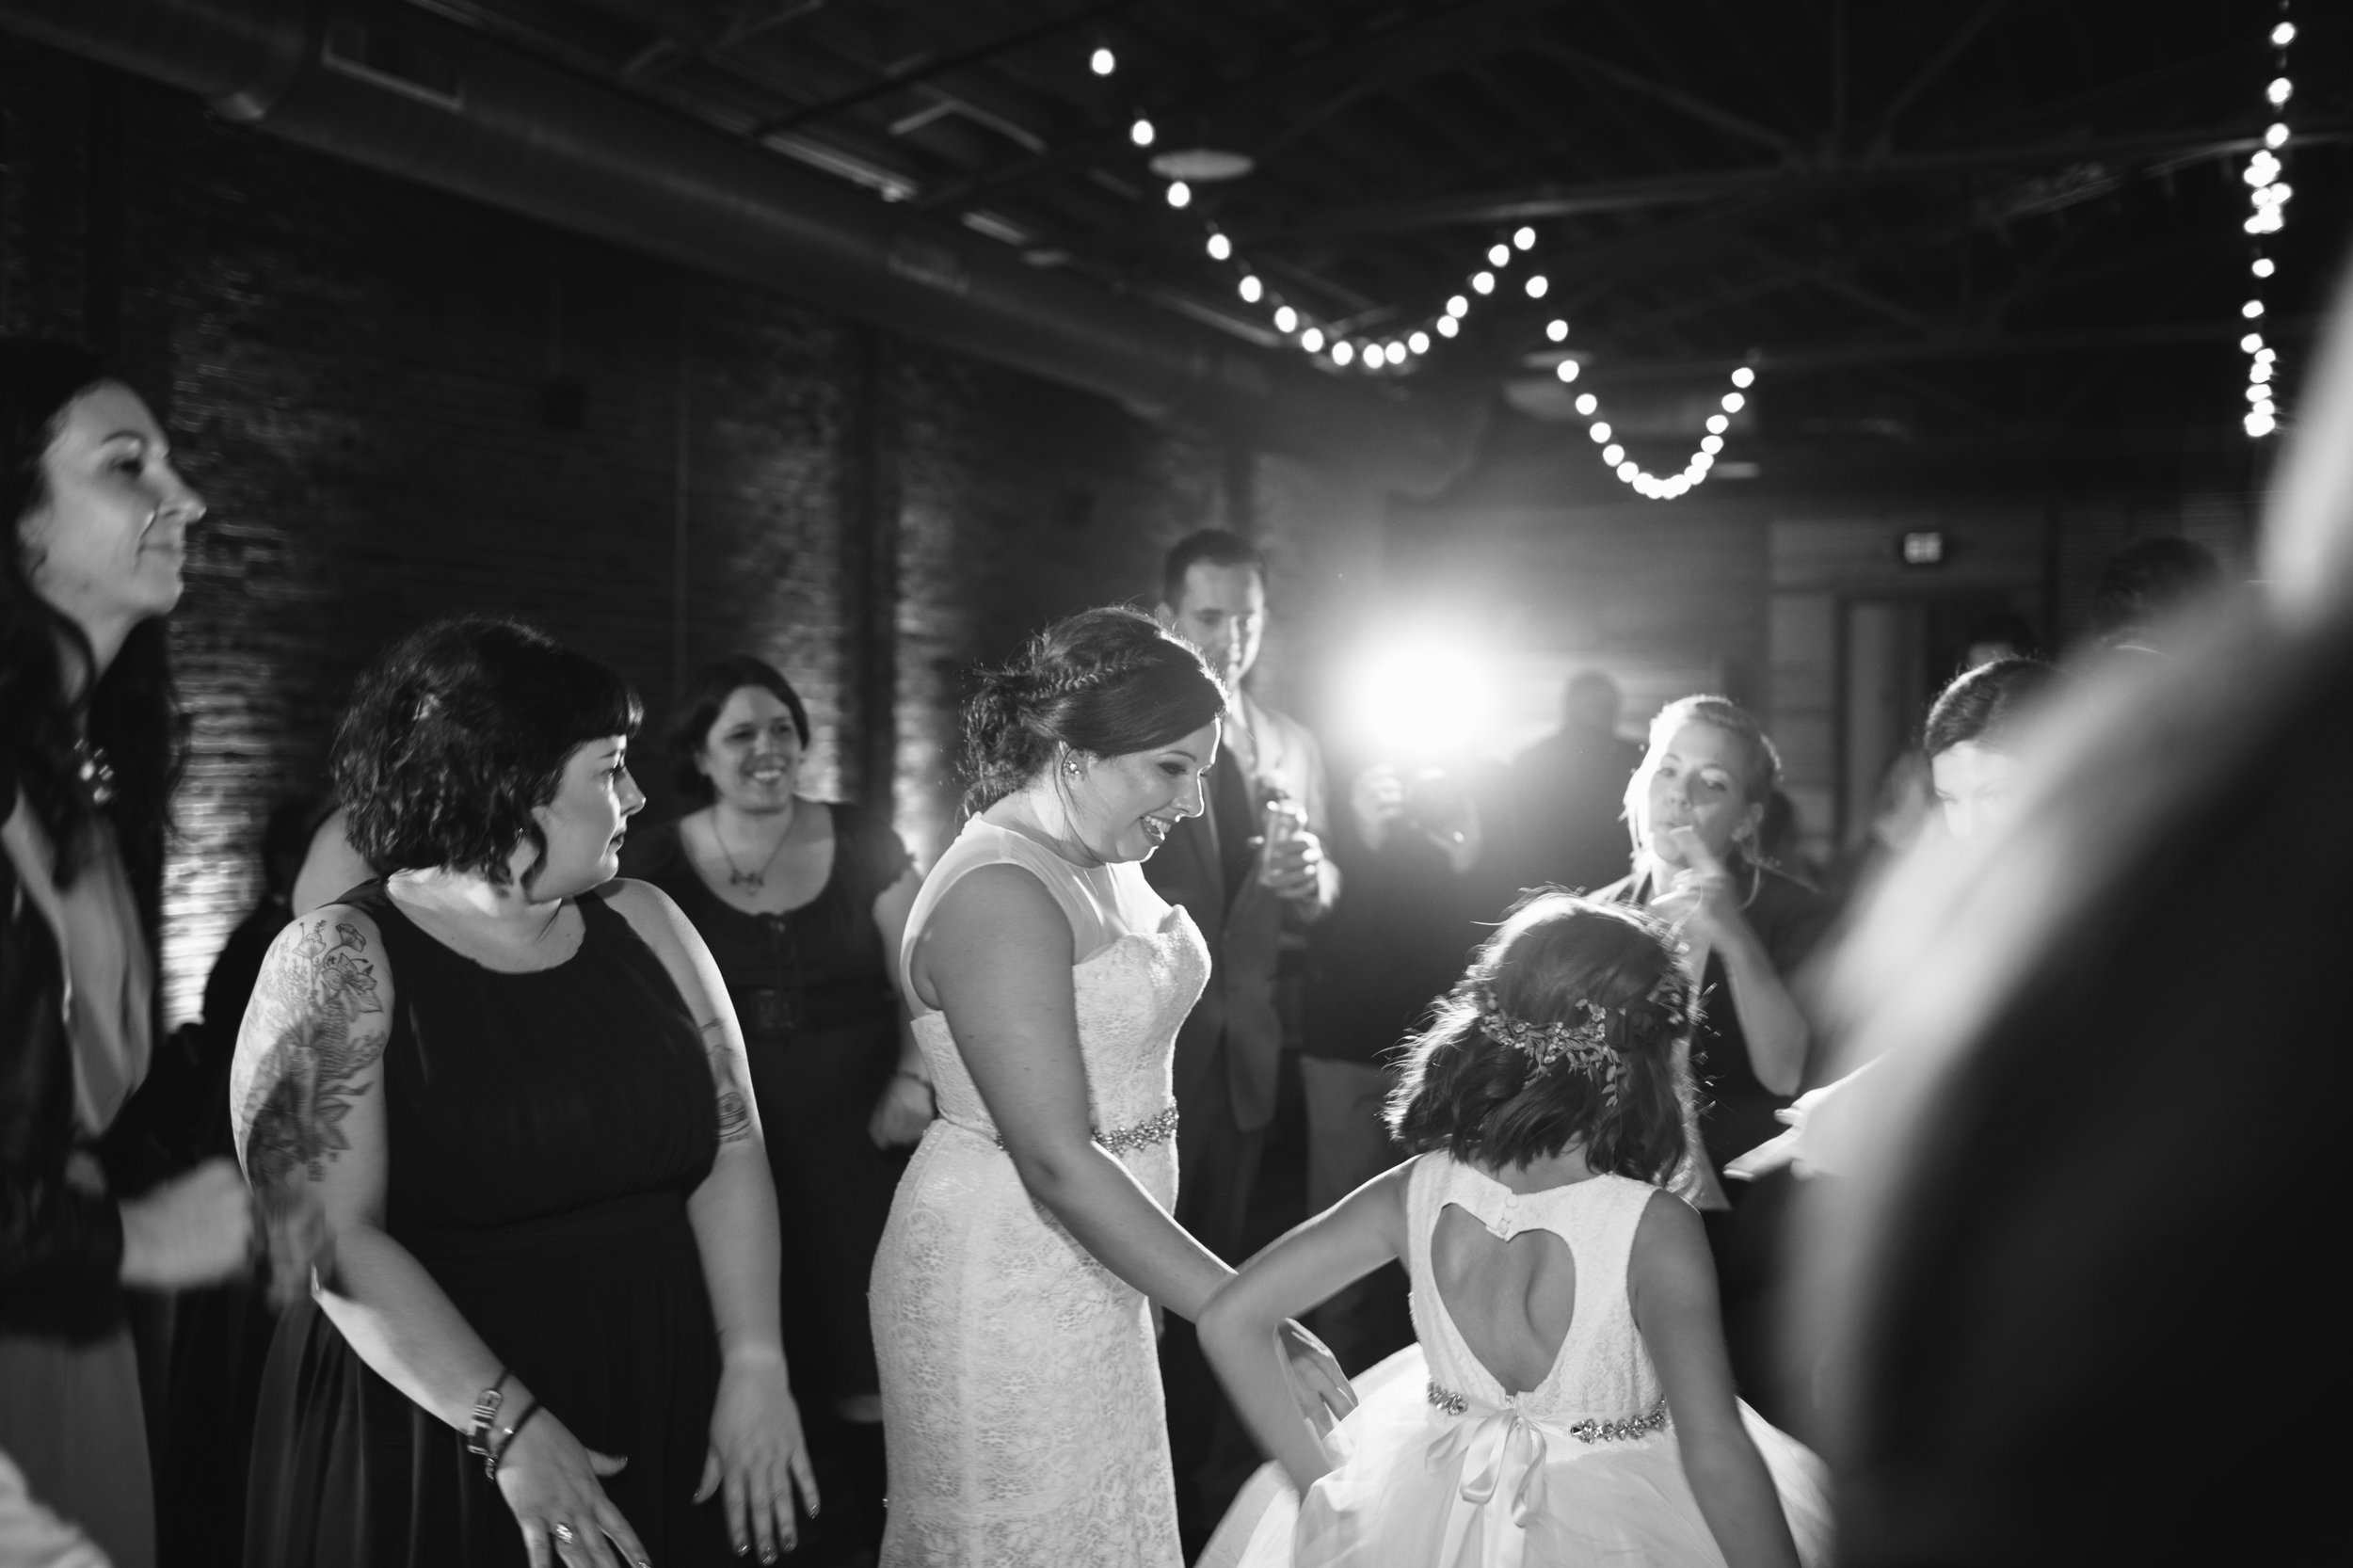 Jessica_Bryan_Wedding_Standard_Knoxville_Abigail_Malone_Photography-758.jpg